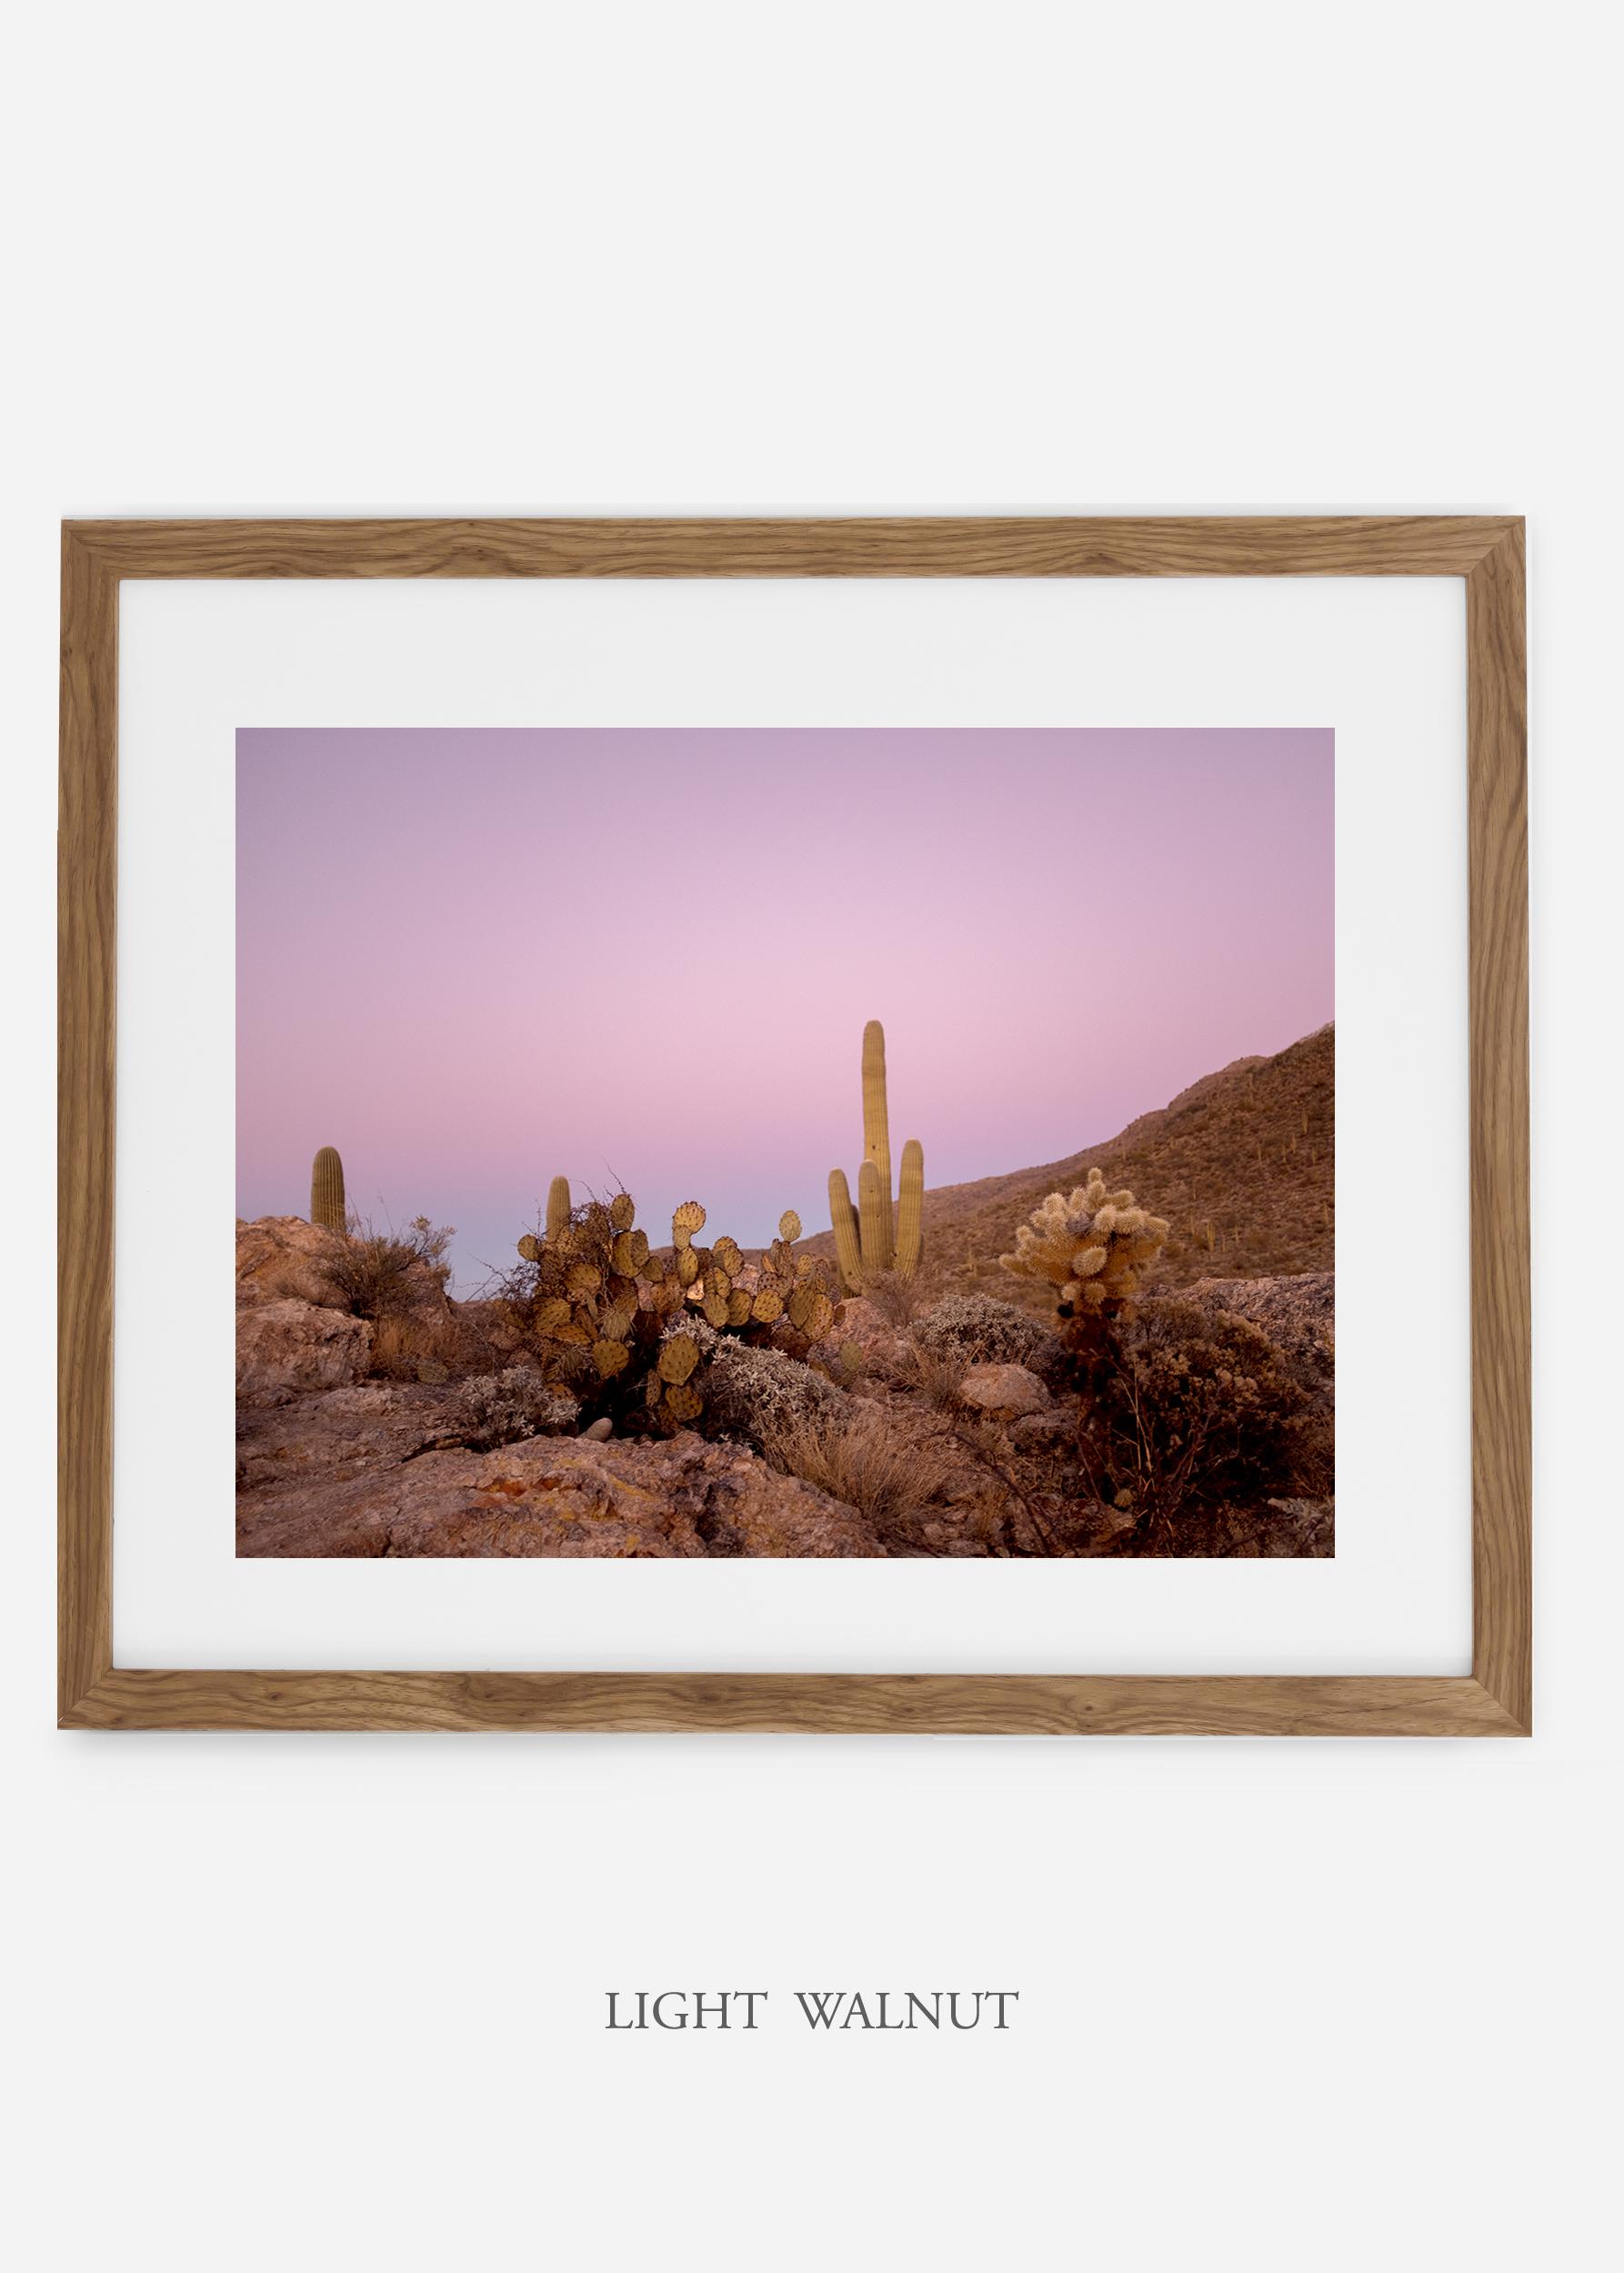 lightwalnutframe-saguaroNo.9-wildercalifornia-art-wallart-cactusprint-homedecor-prints-arizona-botanical-artwork-interiordesign.jpg